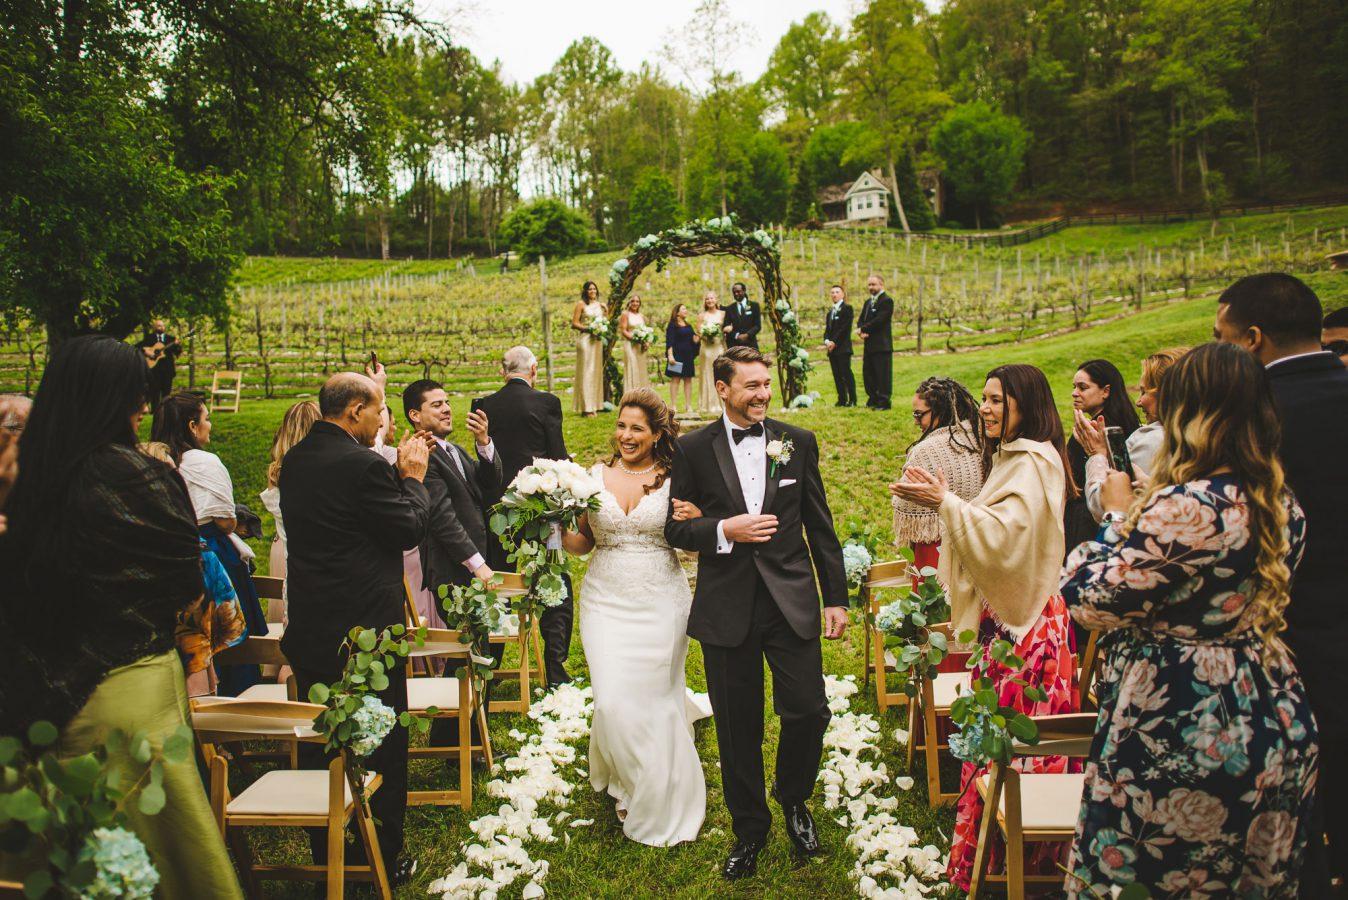 fete-photography-weddings-2017-005